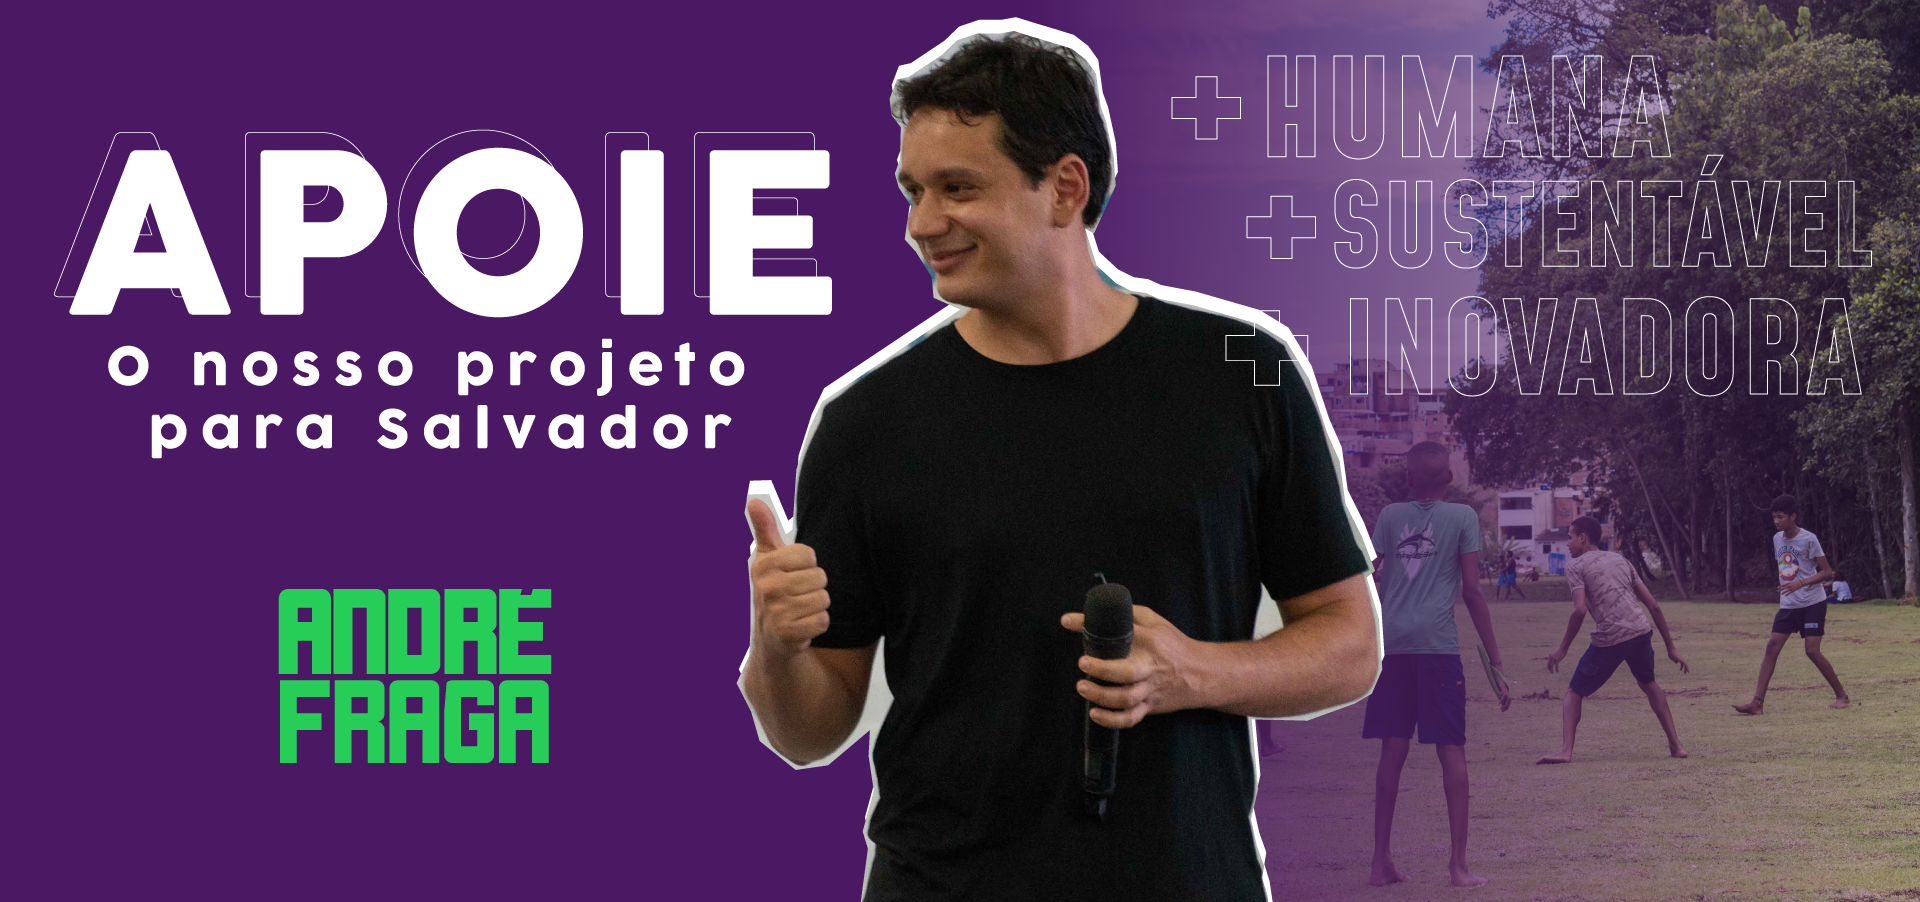 Financiamento André Fraga